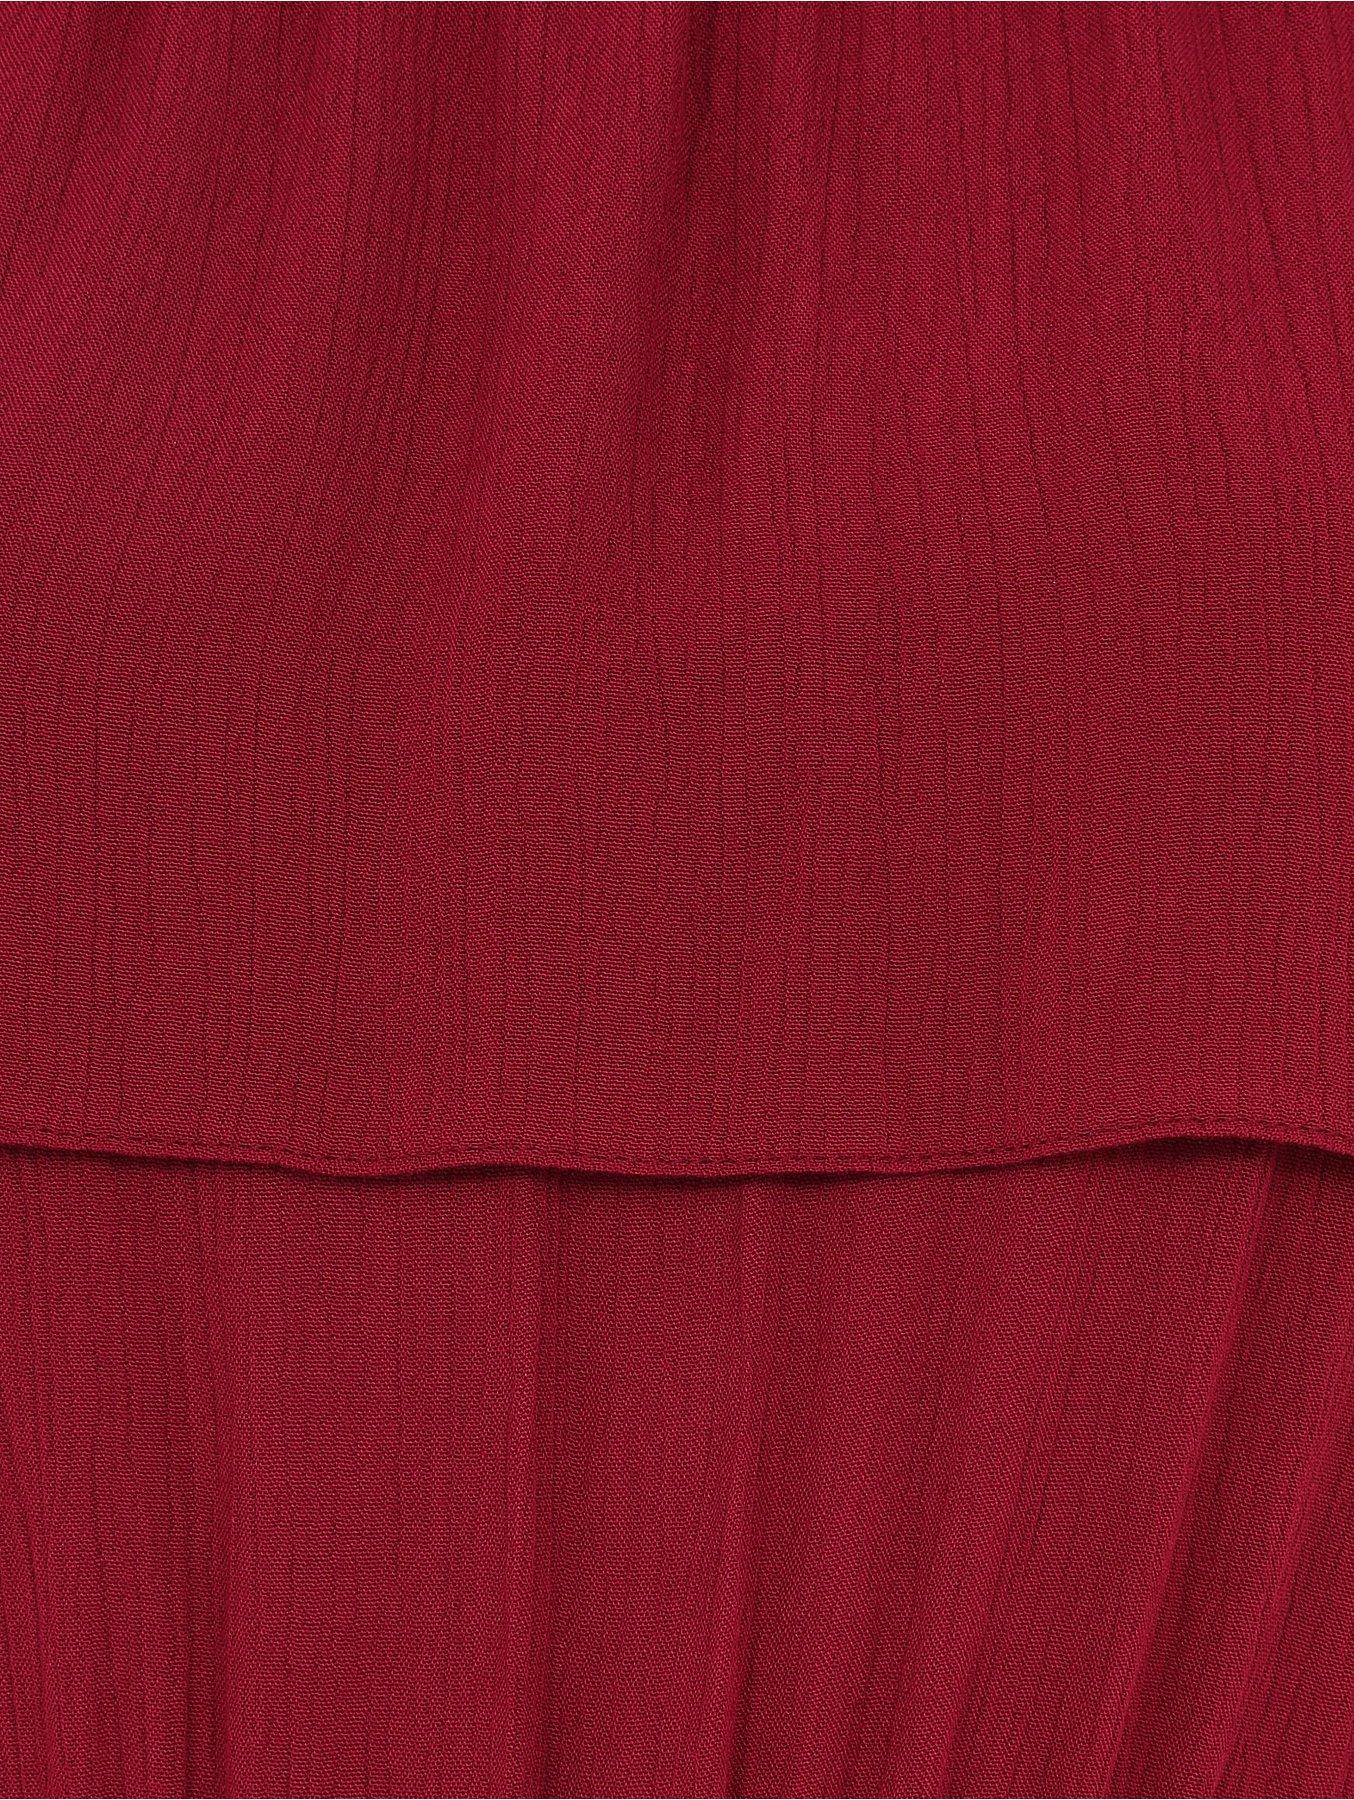 30ee2550d3a Burgundy Textured Bardot Jumpsuit